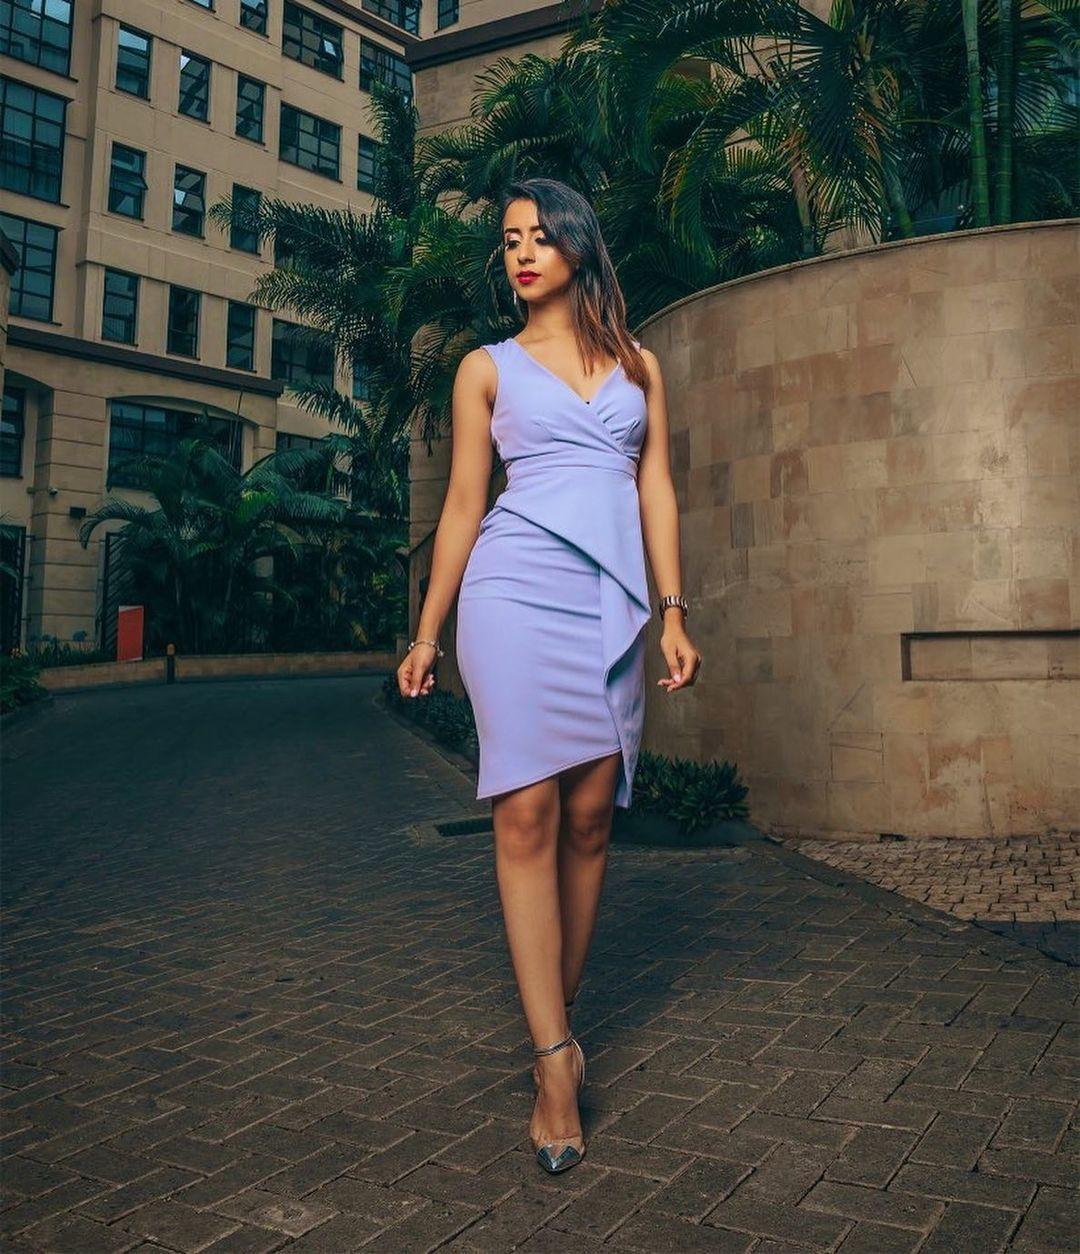 My life took a 180-degree turn – Shiksha Arora opens up on a tough 2020 | Latest Kenyan Entertainment News & Updates | Pulselive Kenya